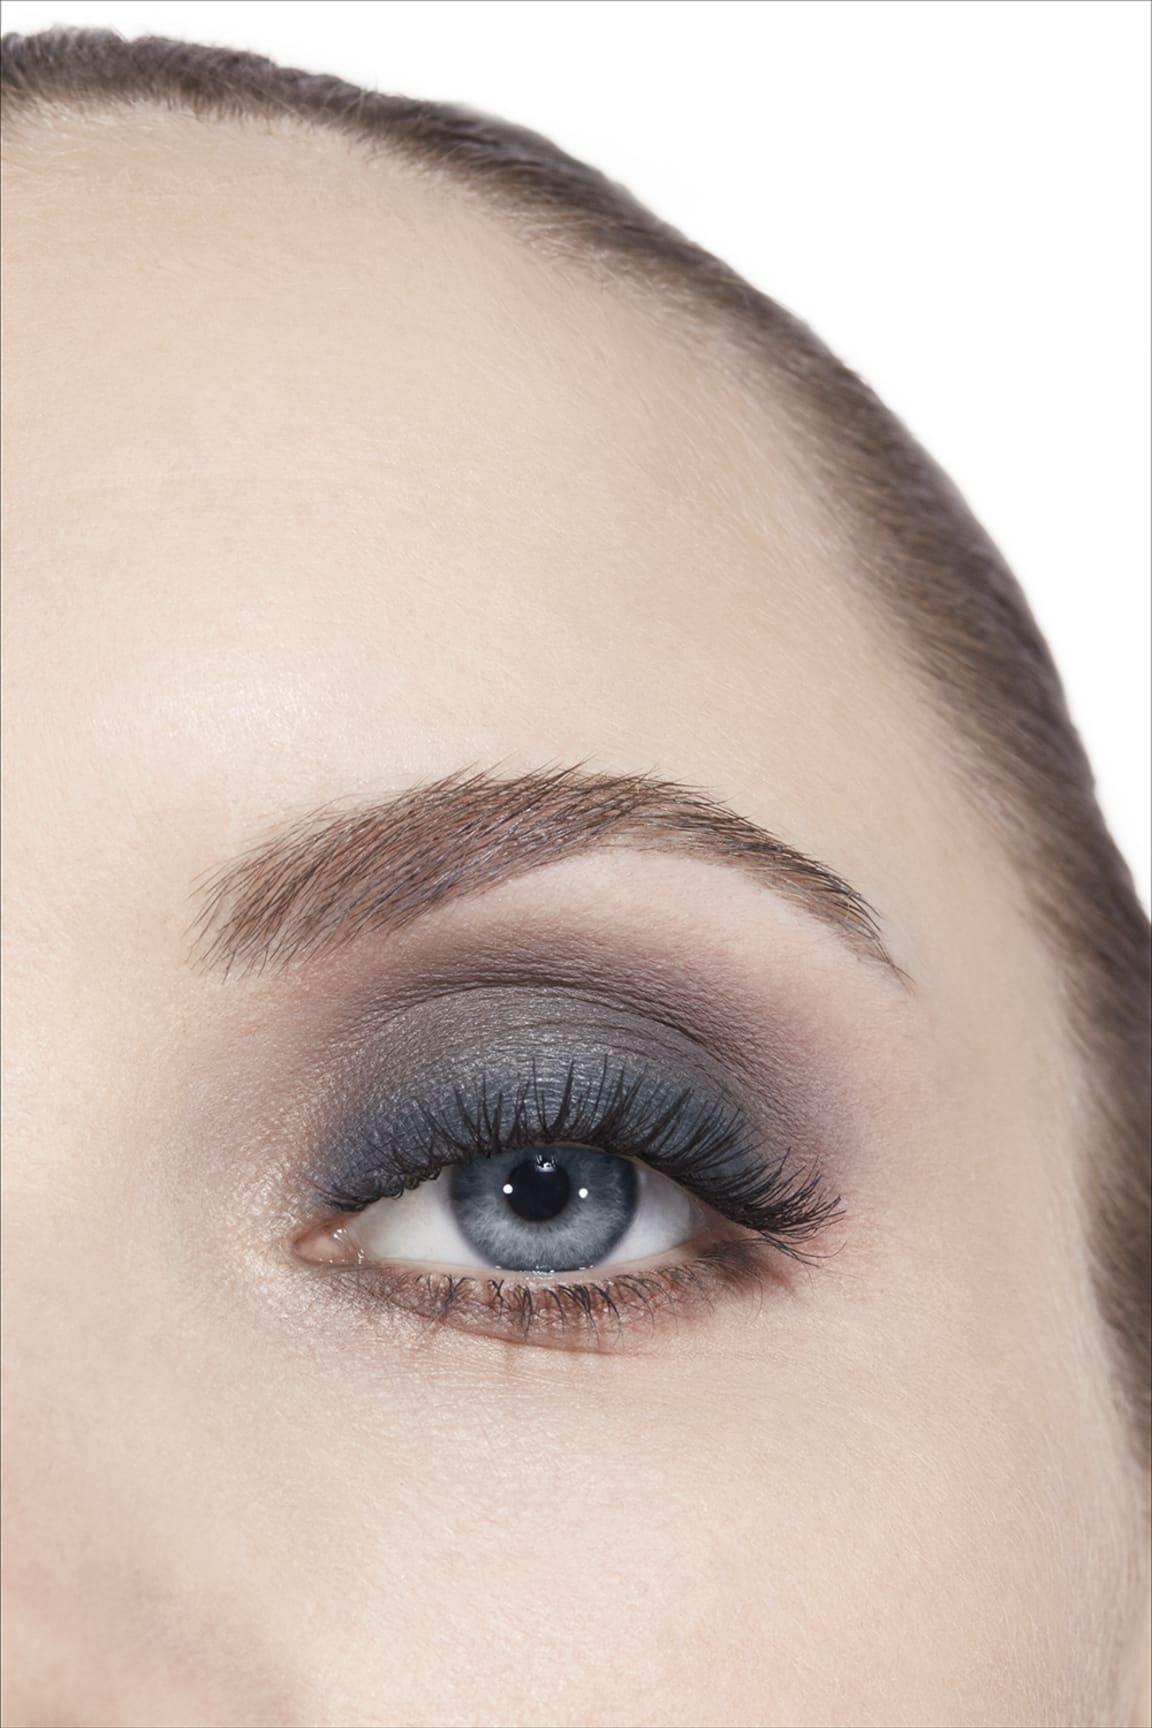 Imagen aplicación de maquillaje 3 - LES 4 OMBRES 324 - BLURRY BLUE